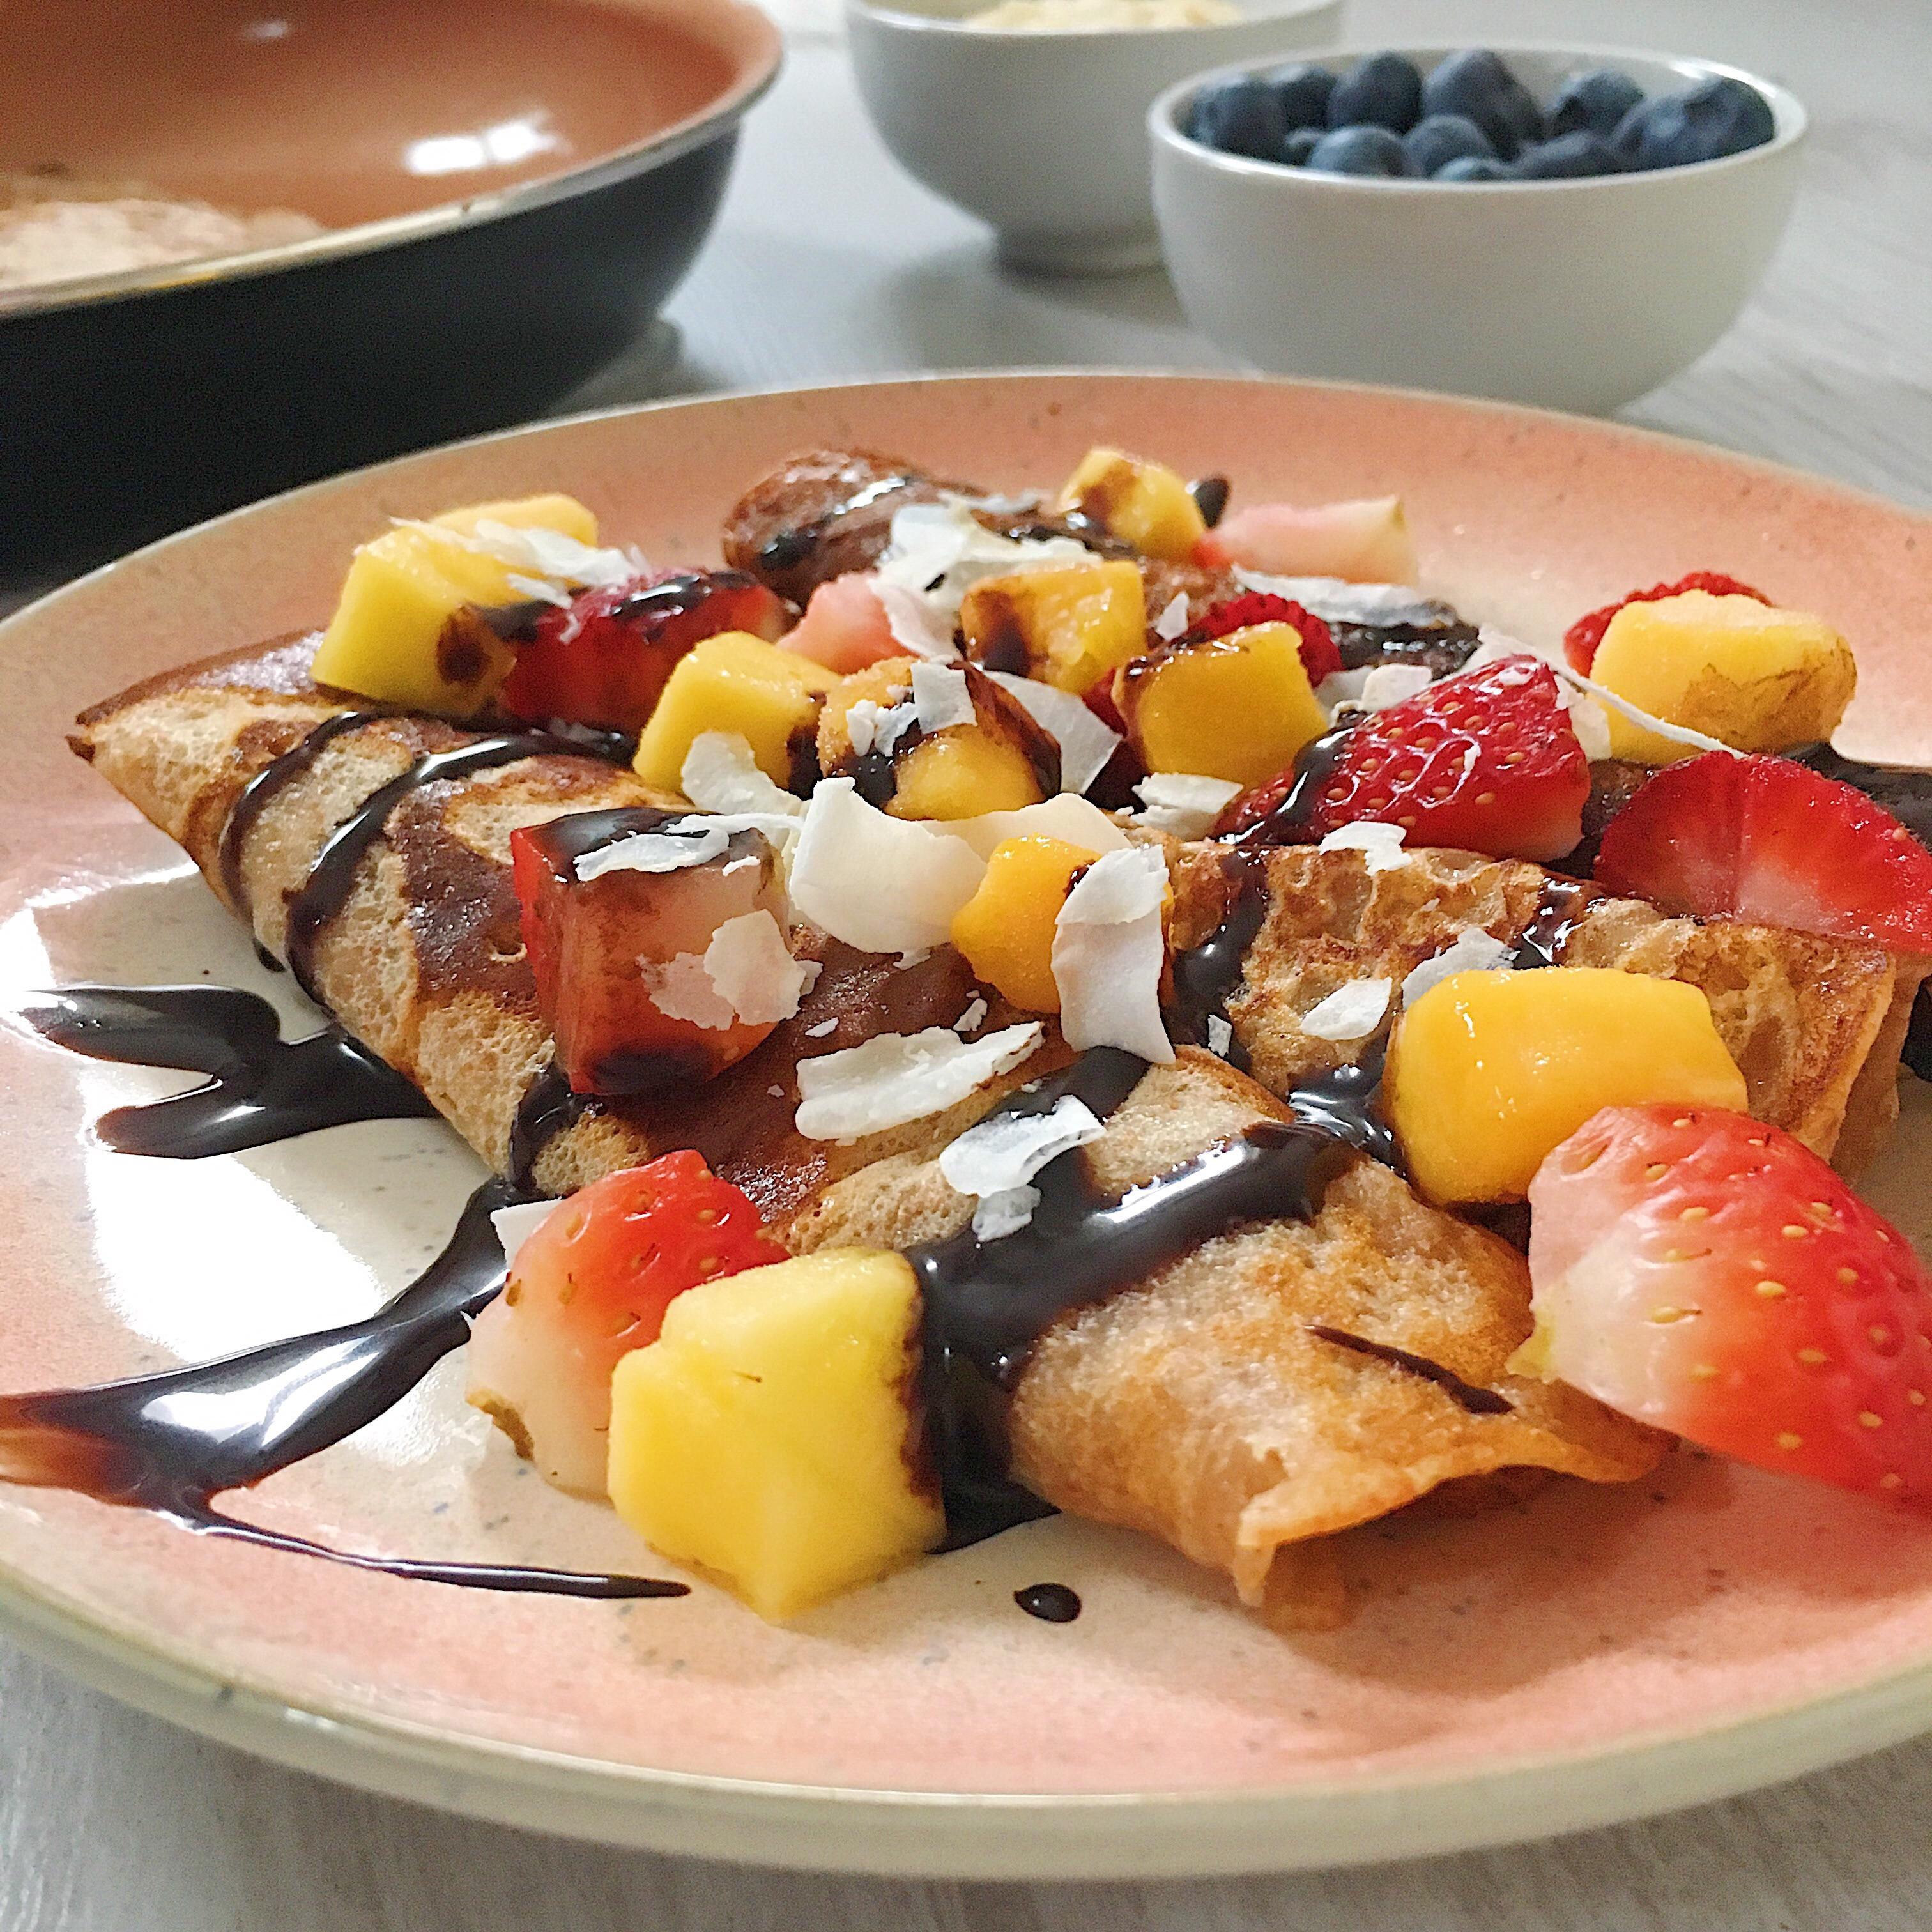 Easy Healthy Gluten Free Recipes  Easy Healthy Crepe Recipe Vegan Gluten Free